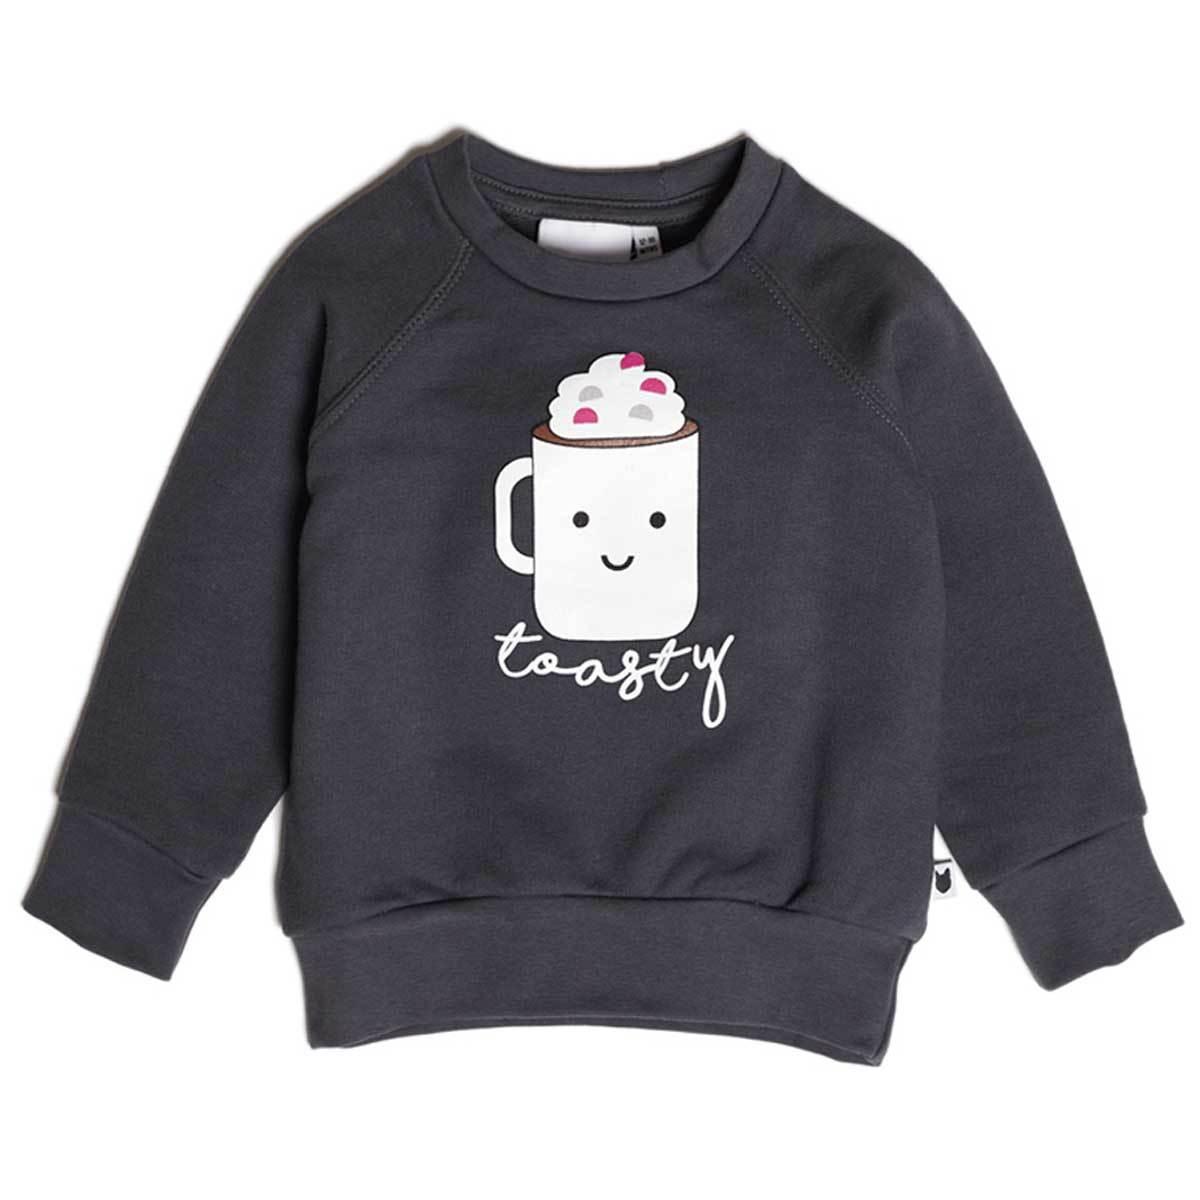 Hauts bébé Sweatshirt Toasty Loopback 3/4 ans Sweatshirt Toasty Loopback 3/4 ans